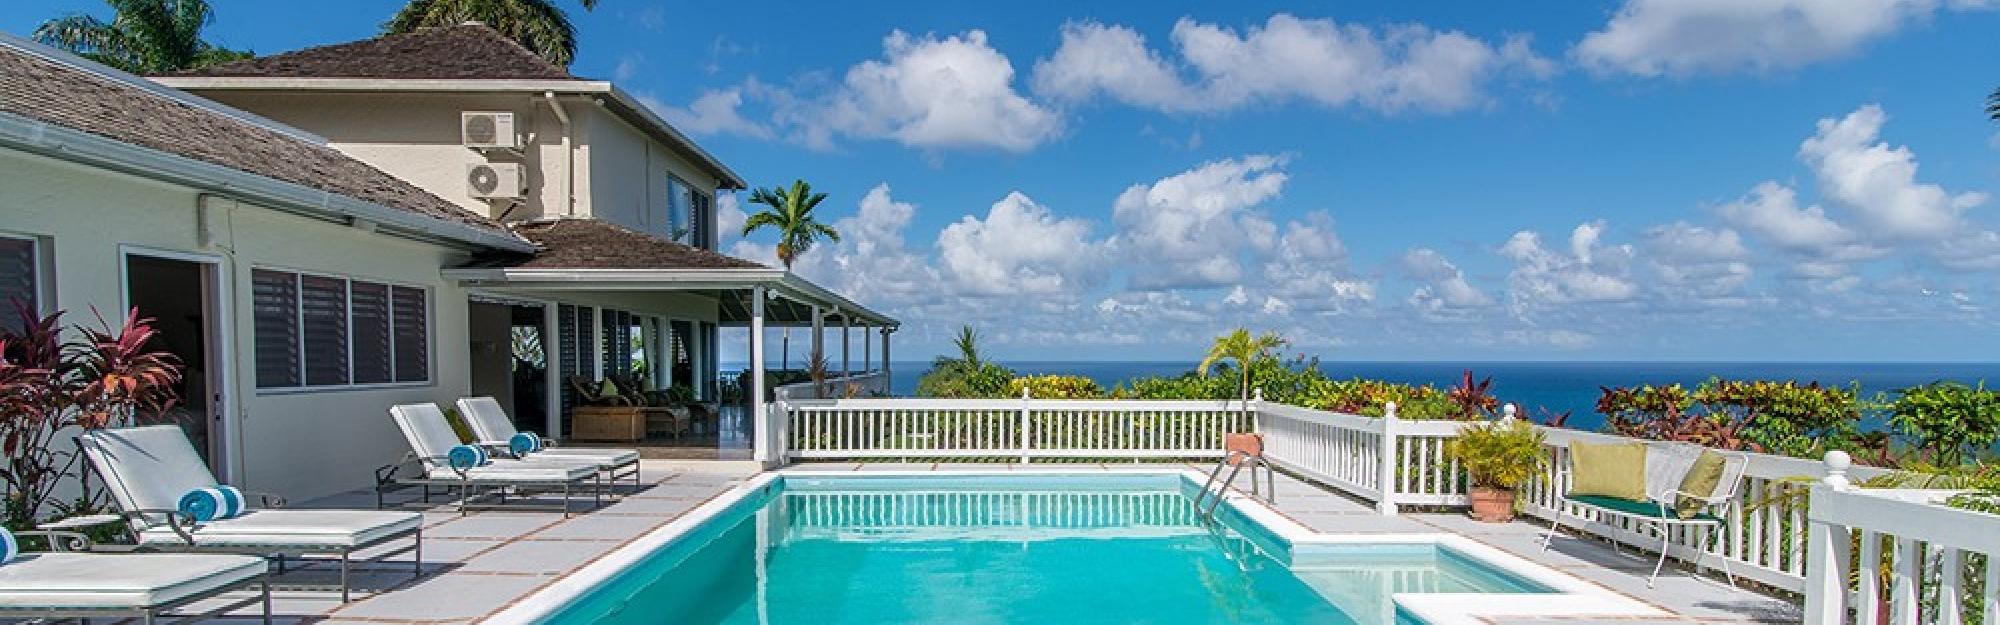 Blue Heaven Jamaica Villa By Linda Smith